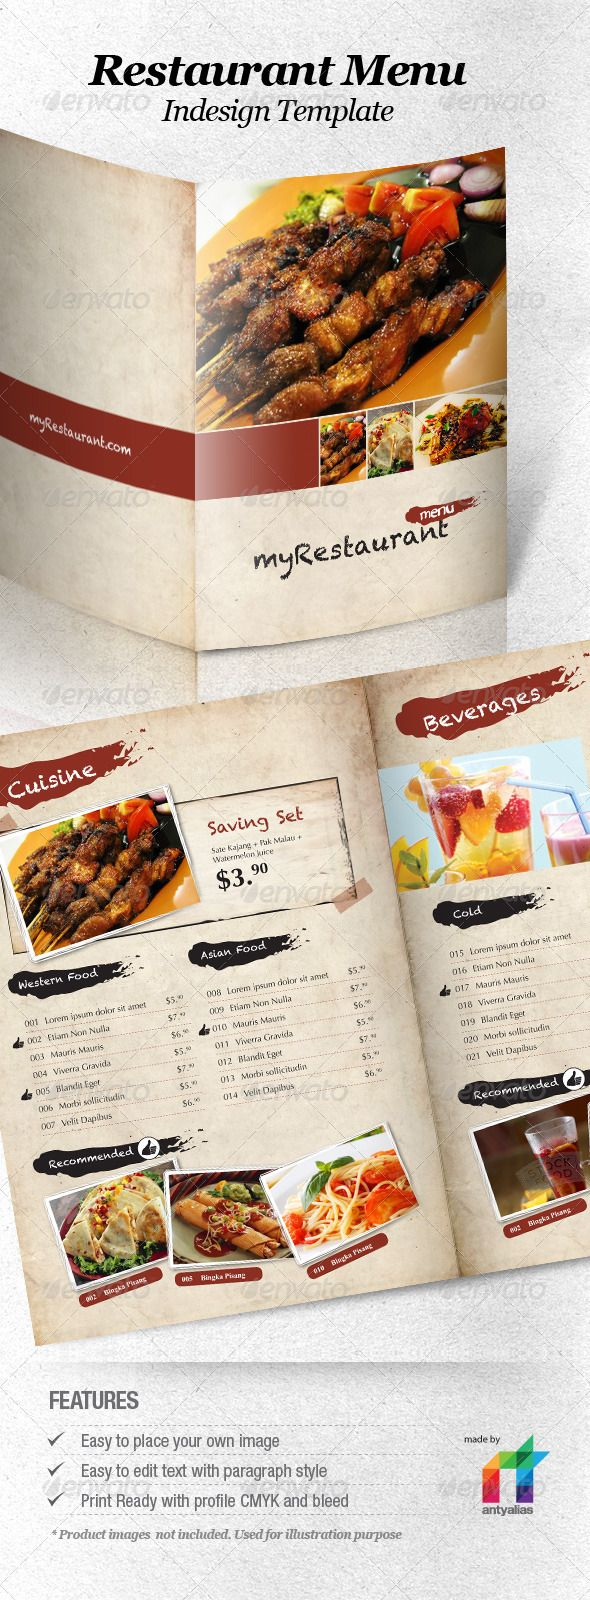 Restaurant Menu Indesign Template | Indesign templates, Menu and ...